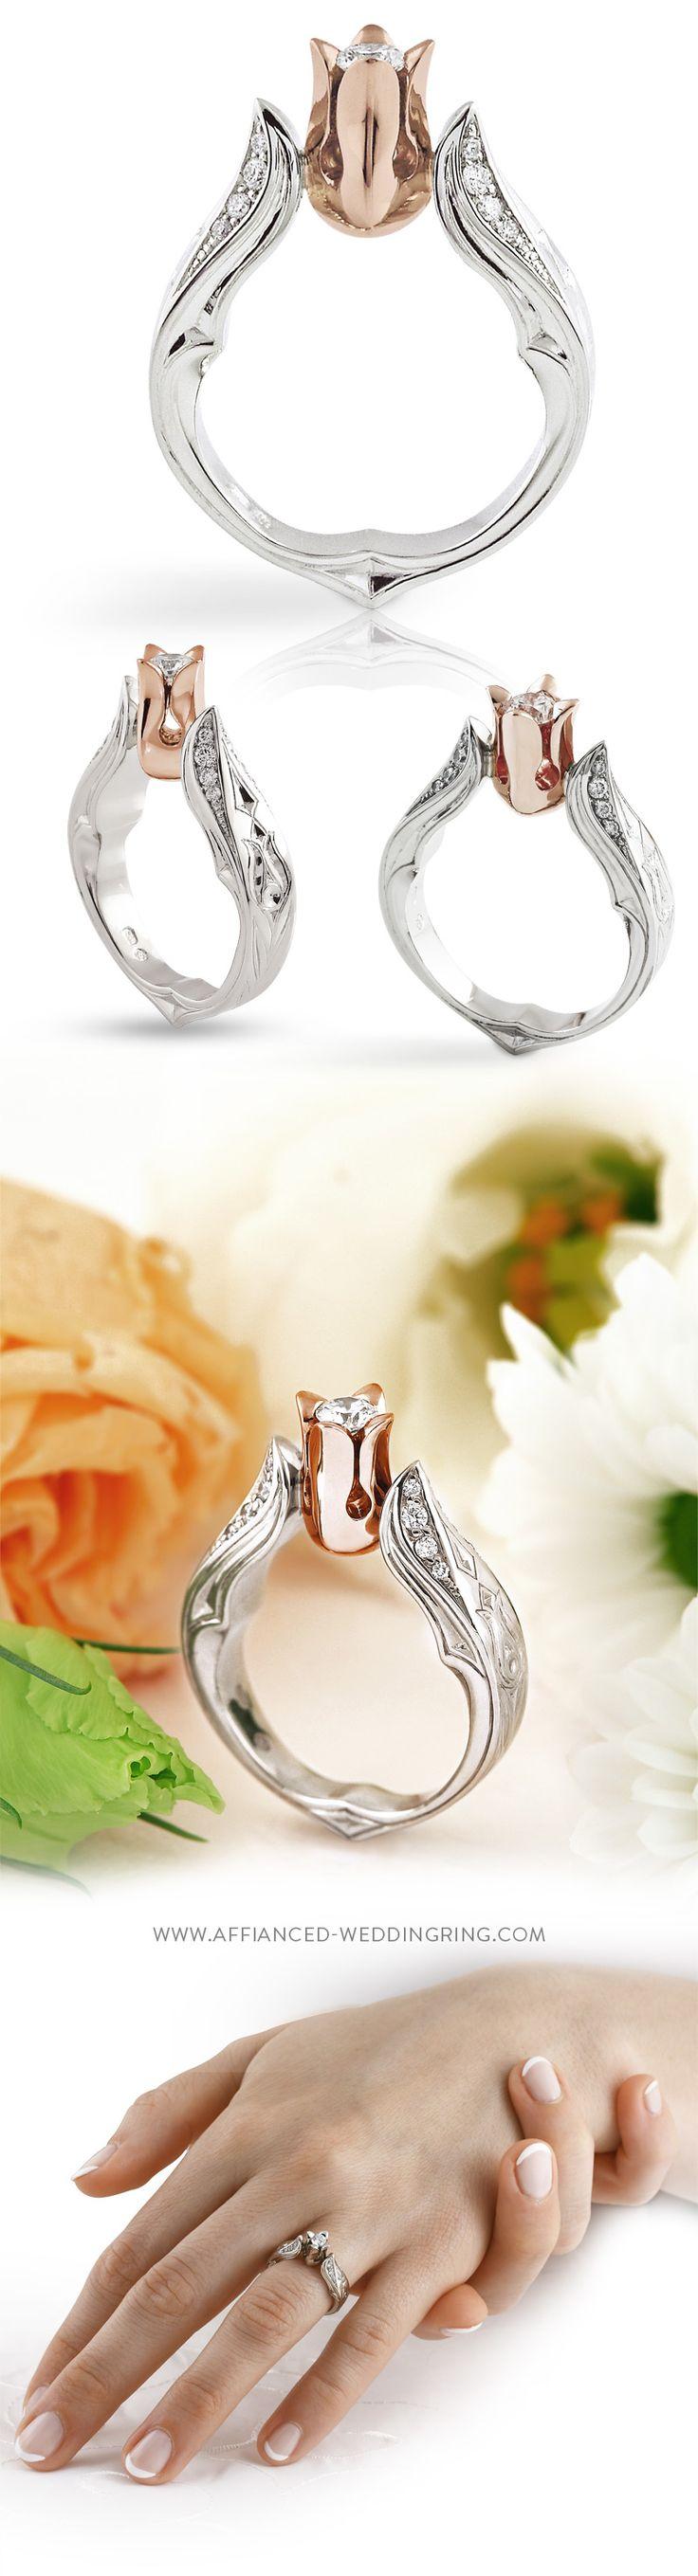 704 best Engagement Rings images on Pinterest